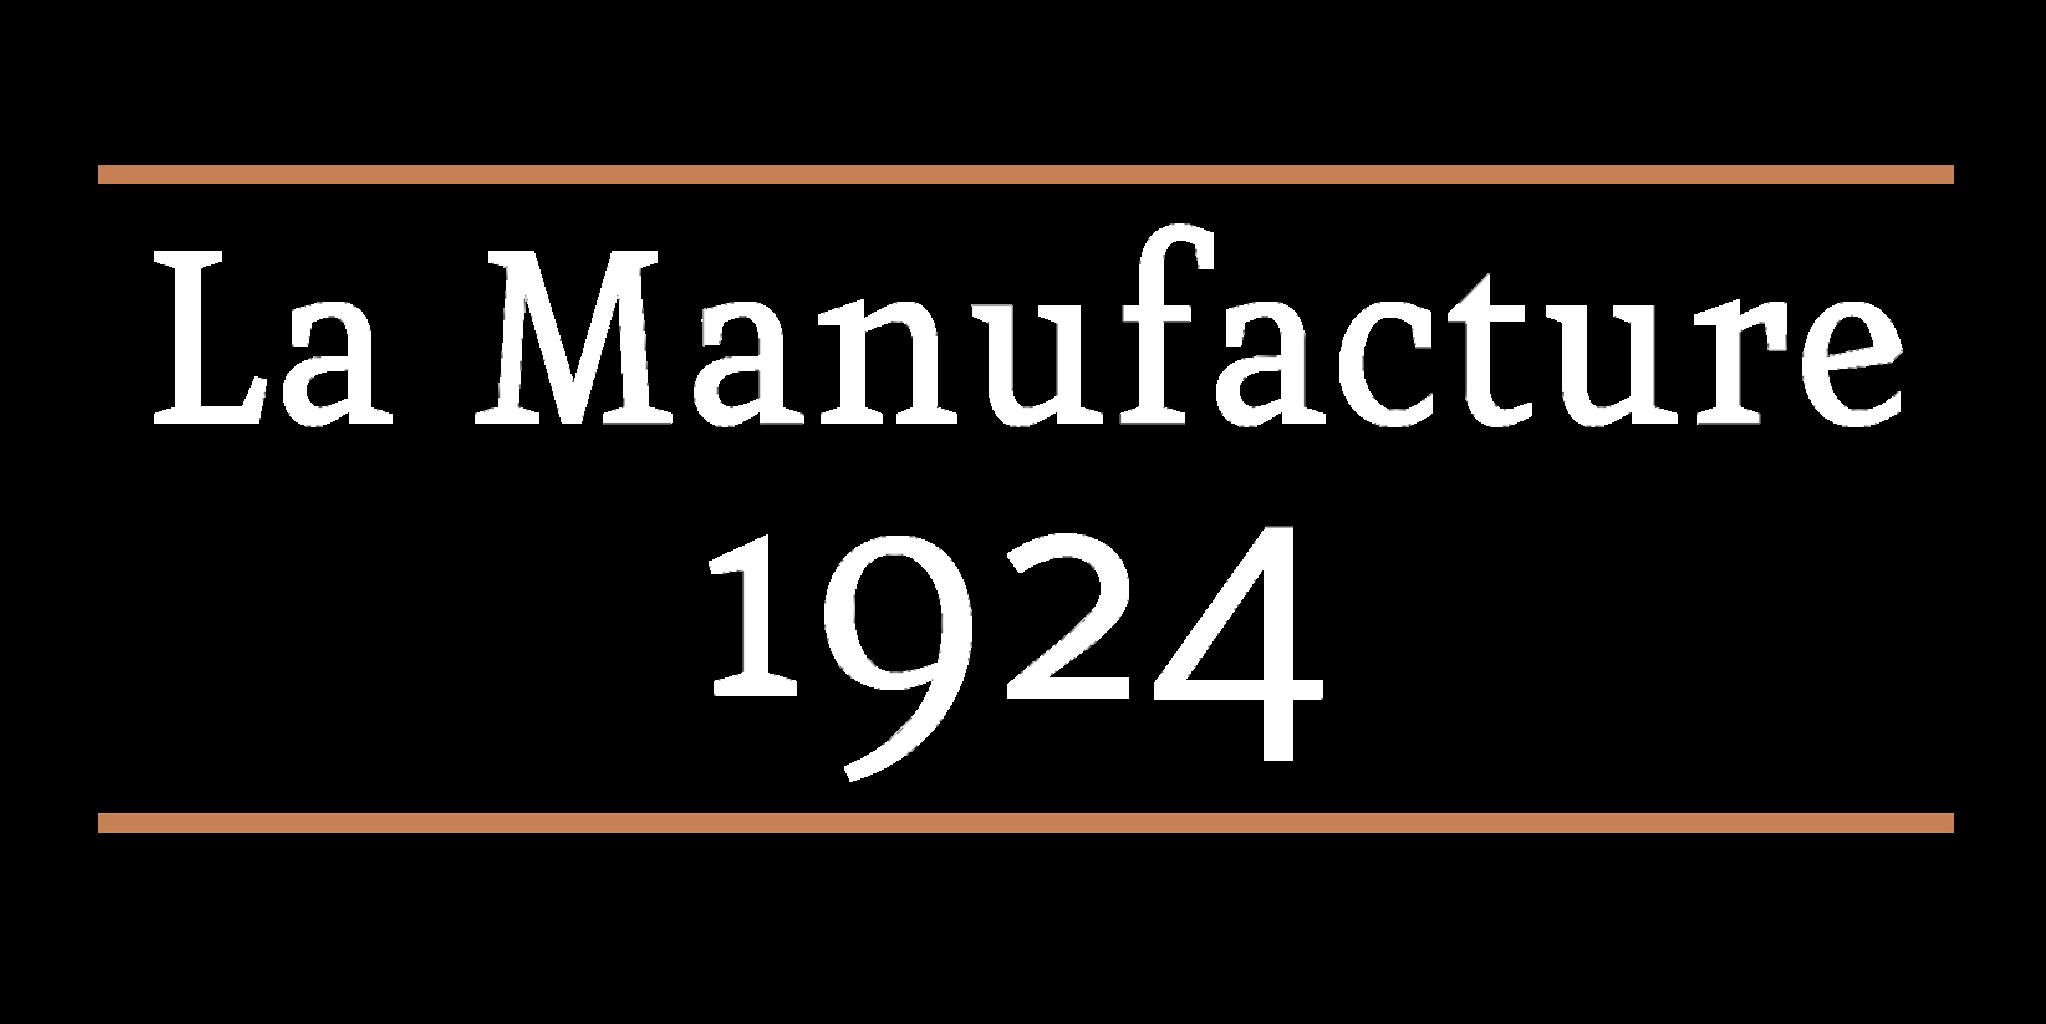 La Manufacture 1924 logo grand transparent blanc